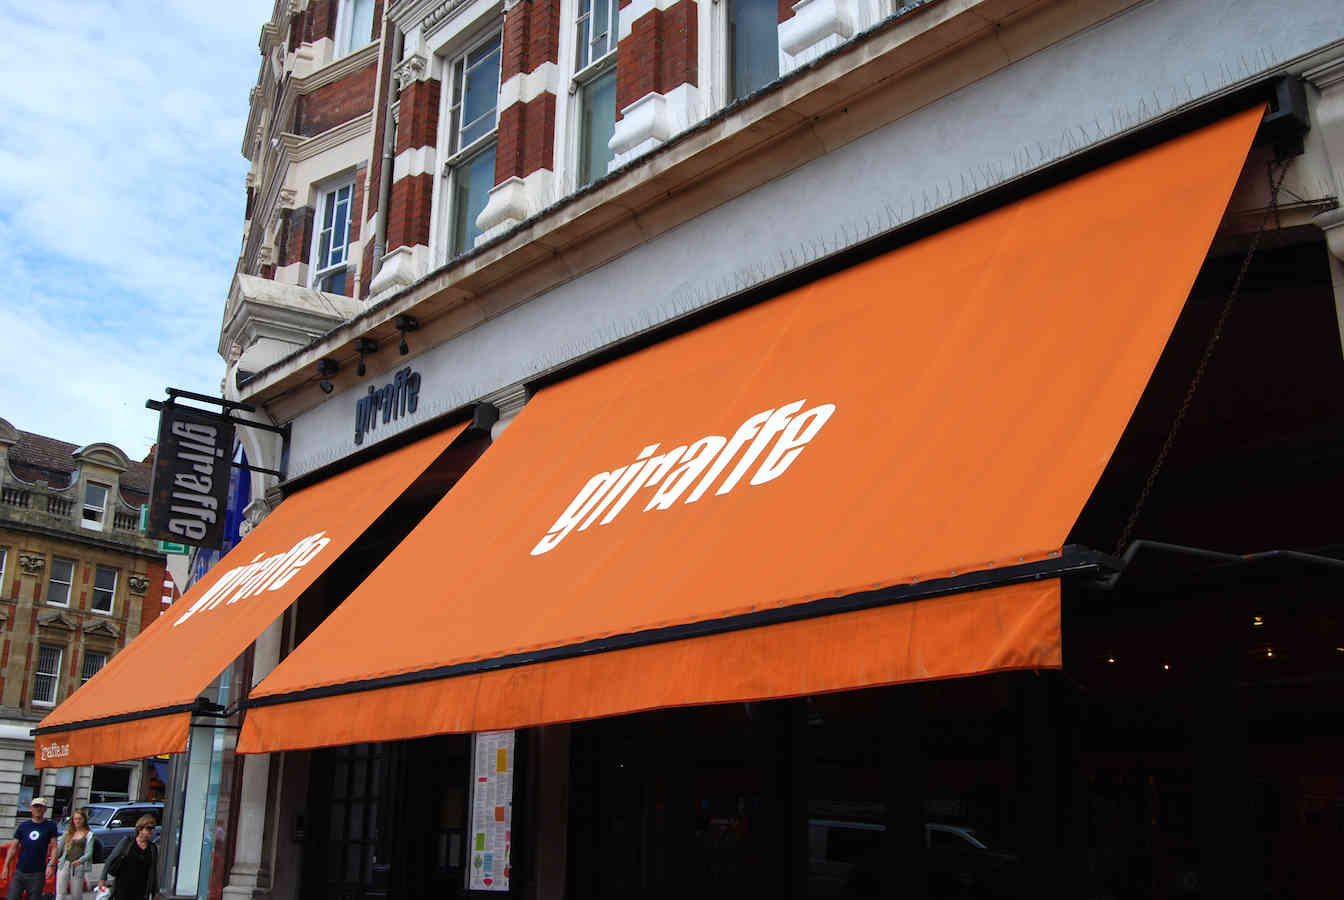 Victorian Awnings London – Giraffe Restaurant